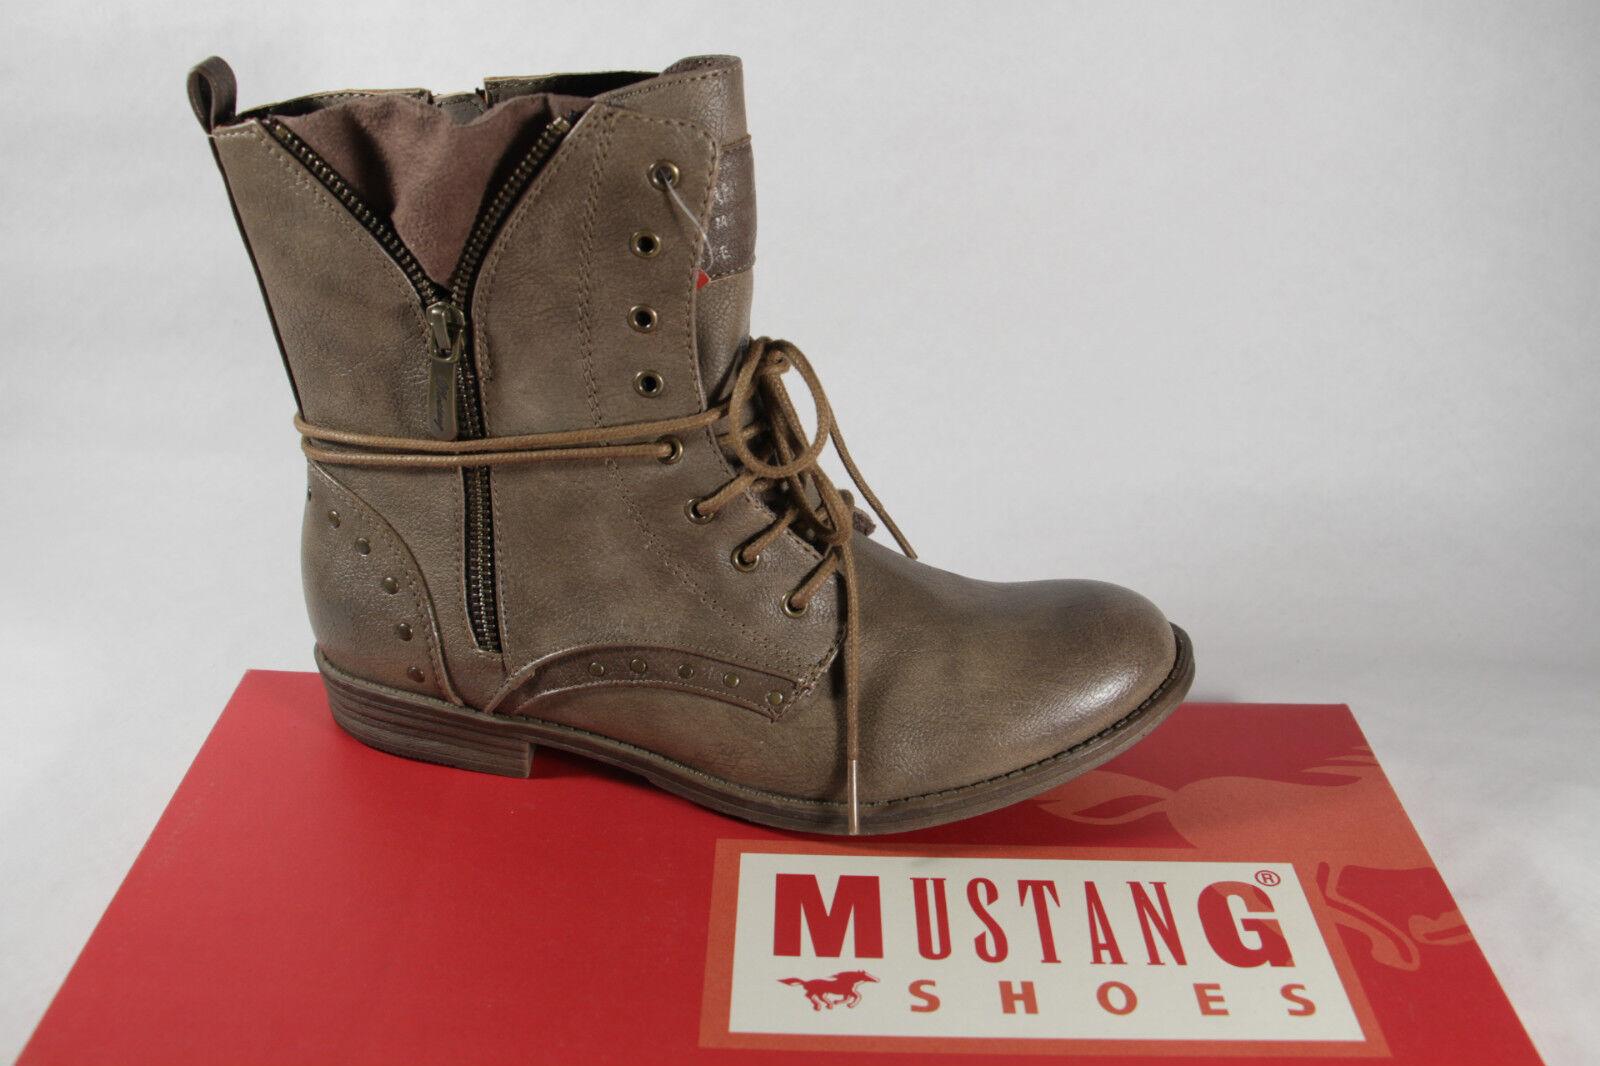 Mustang Stiefel, NEU Stiefeletten Boots, braun pfeffer NEU Stiefel, 865e25